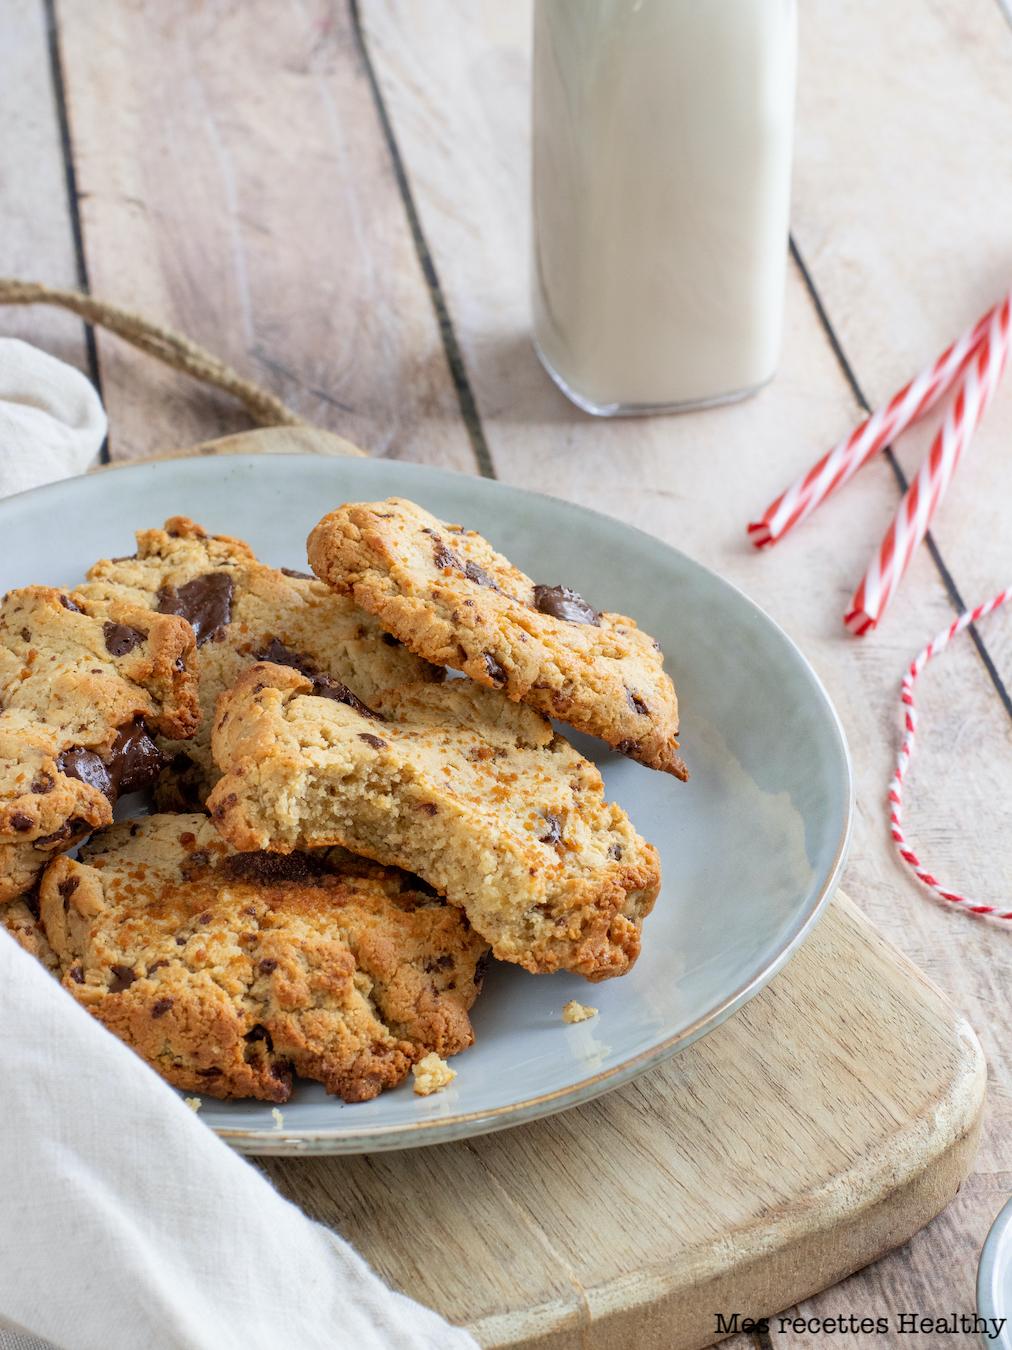 recette healthy-cookie-biscuit-noix de cajou